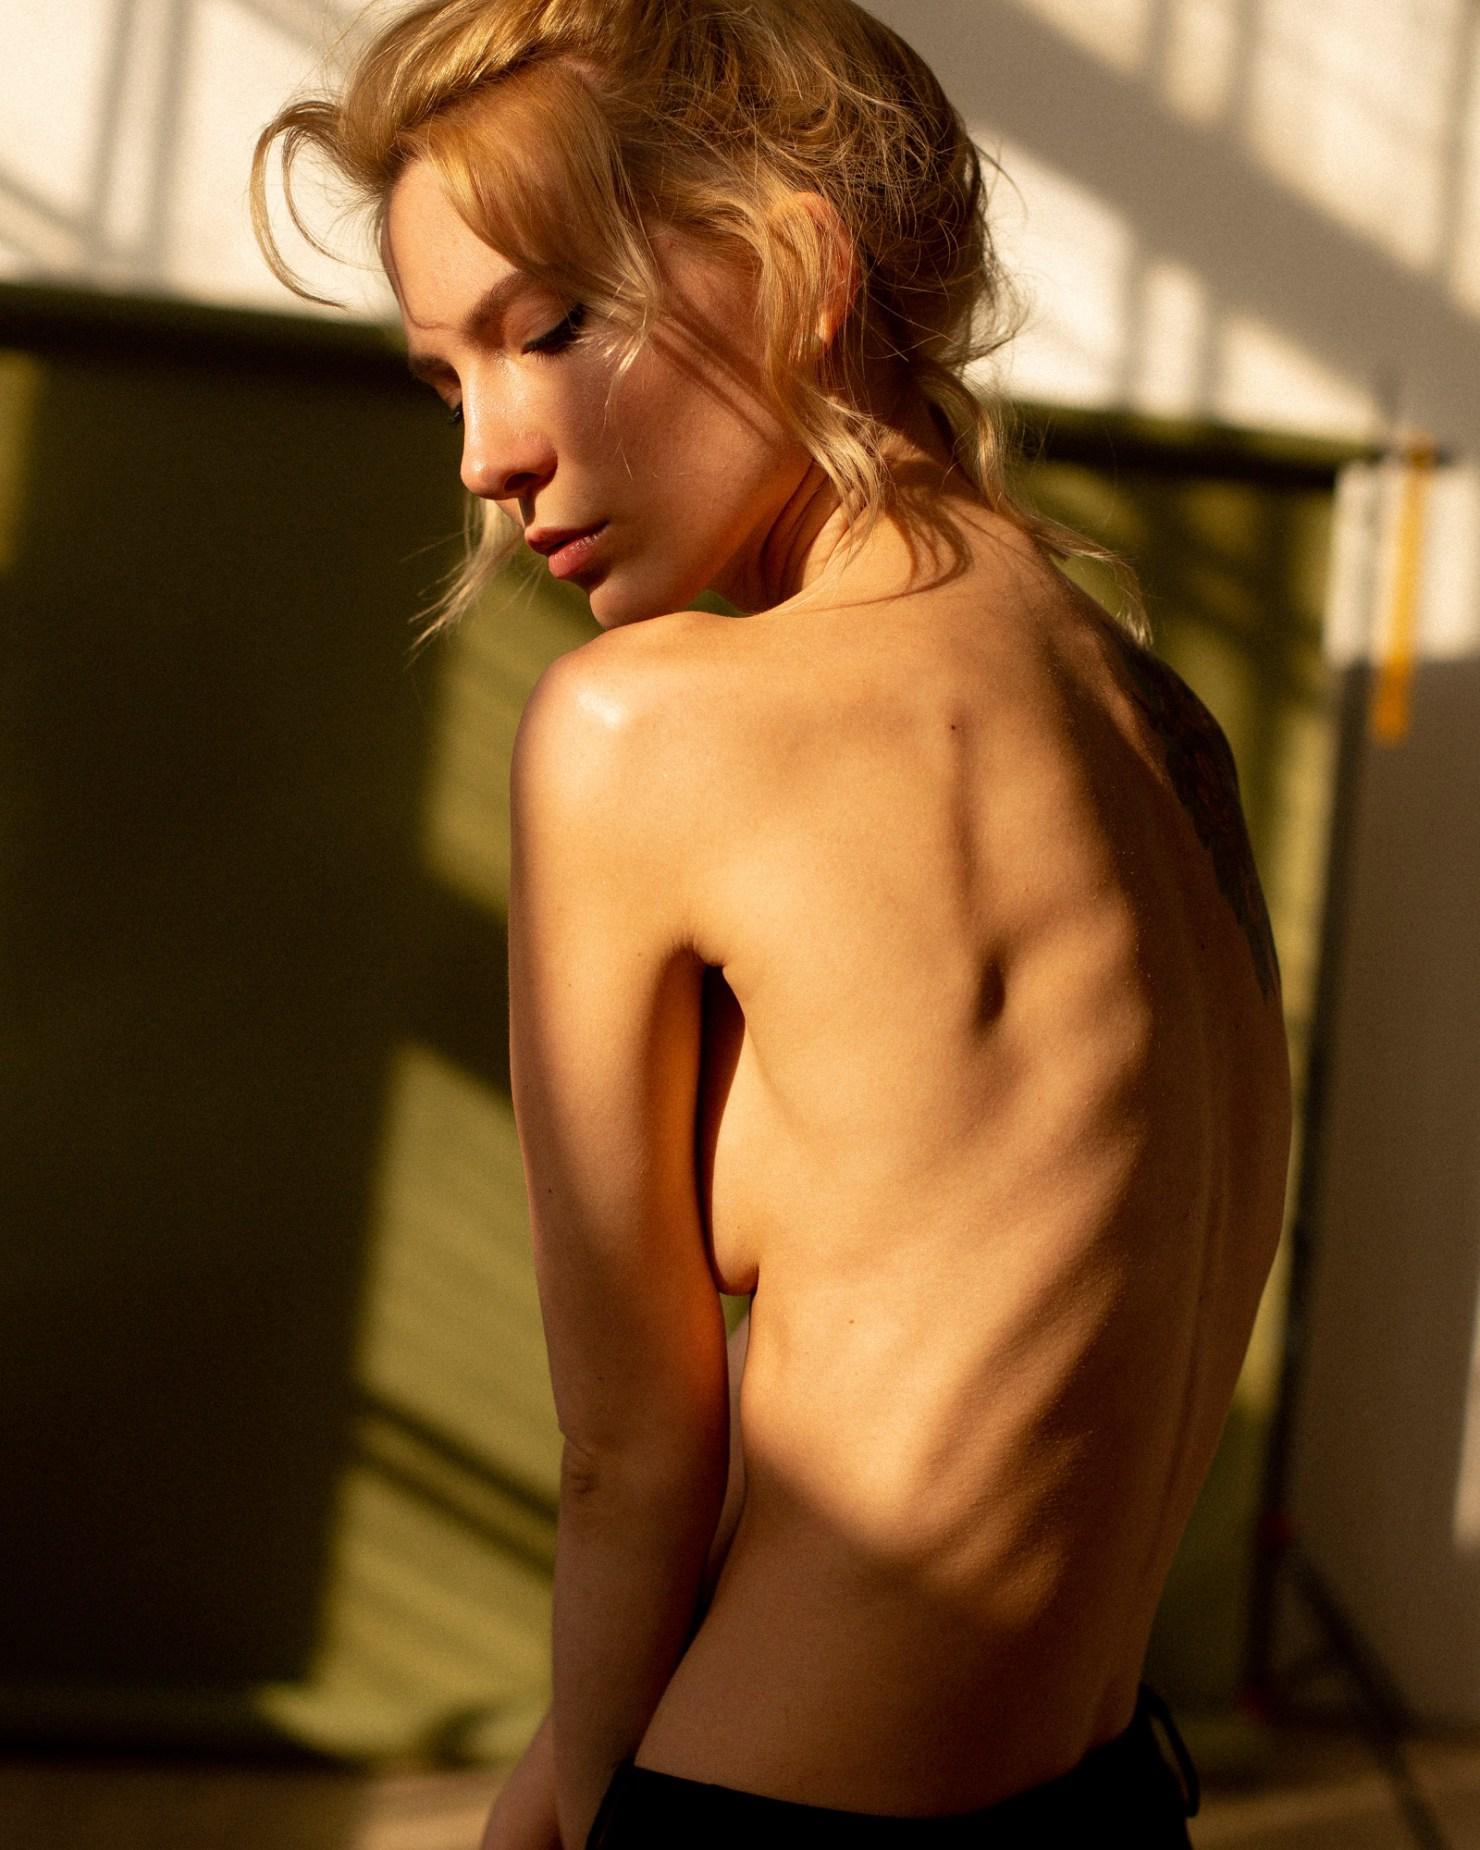 Amy Macdonald Topless stefania iodkovskaya - portraits of girls